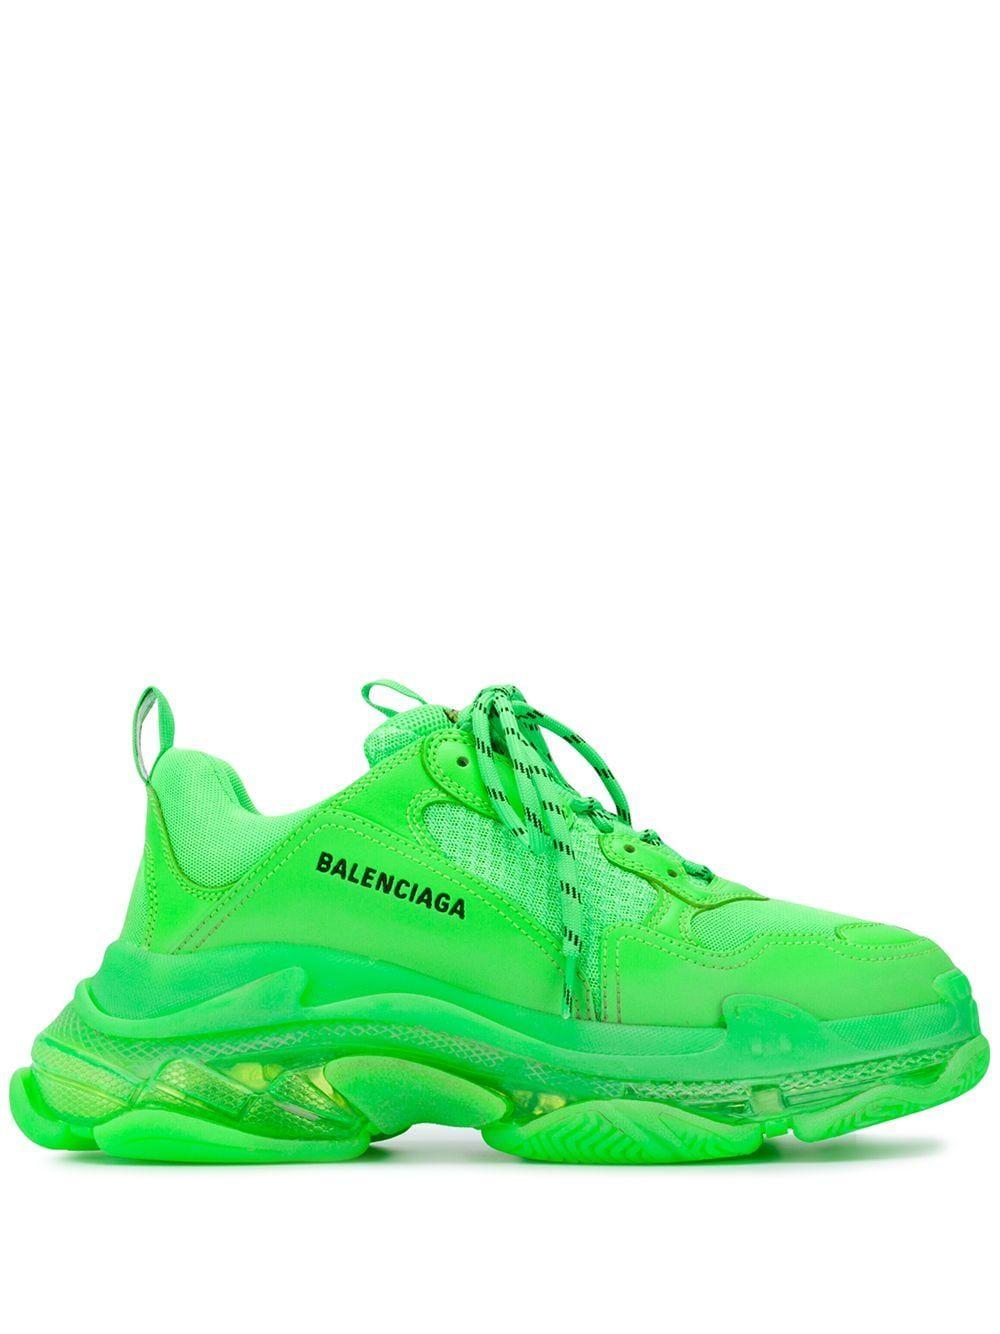 Balenciaga Triple S sneakers $995 - Buy